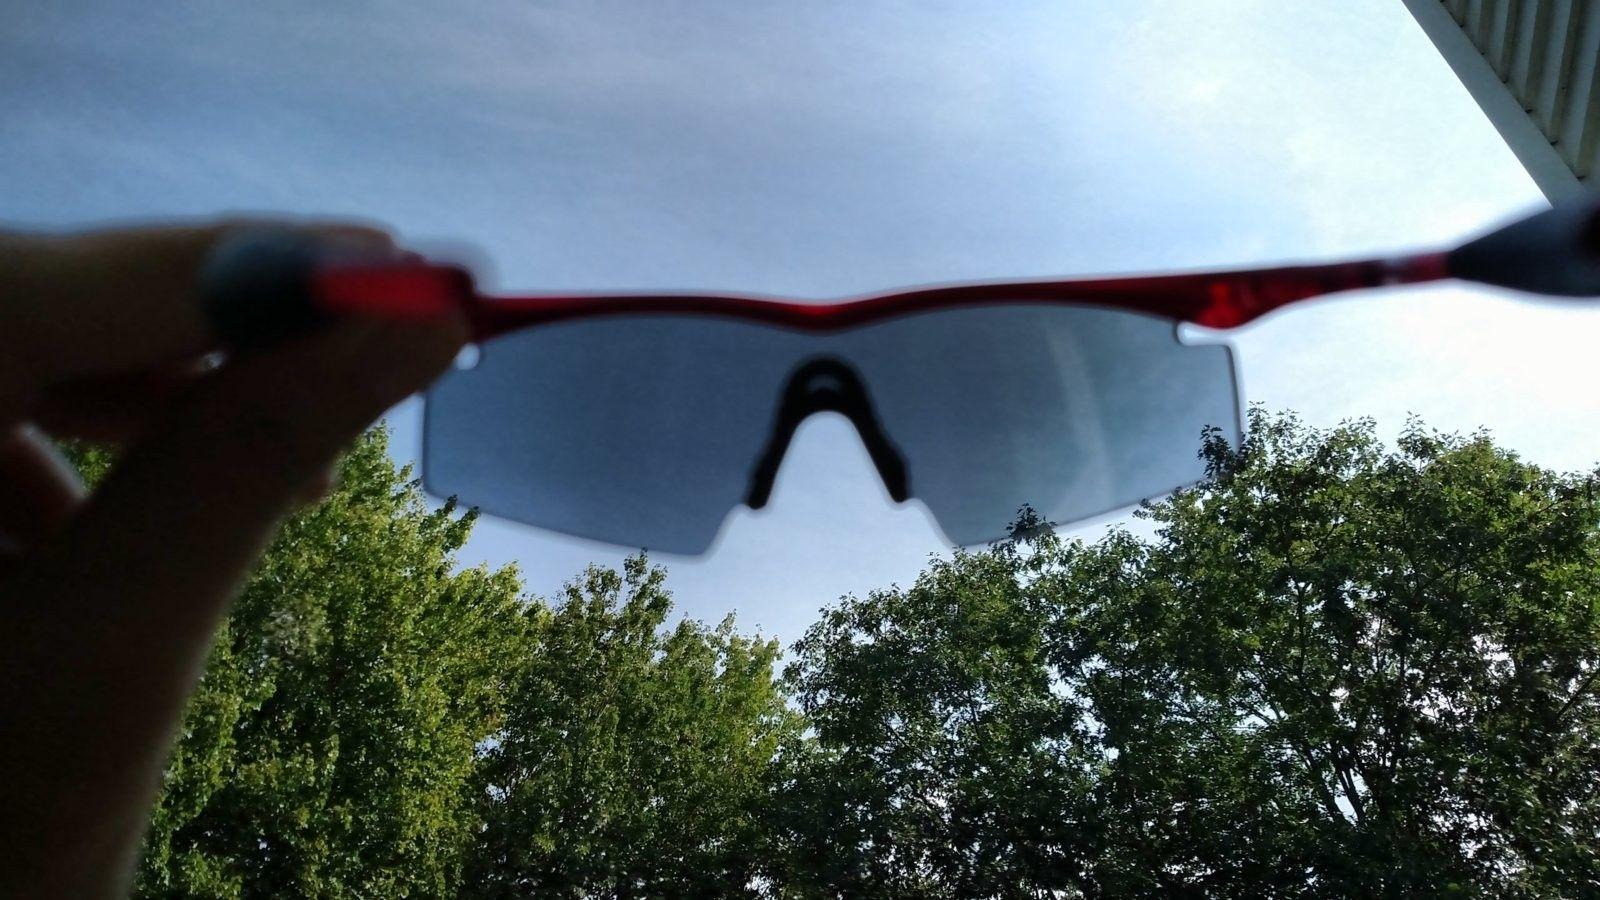 M Frame w/Crystal Red Frame, Grey Lens - BNIB - IMG_20160903_131708755.jpg